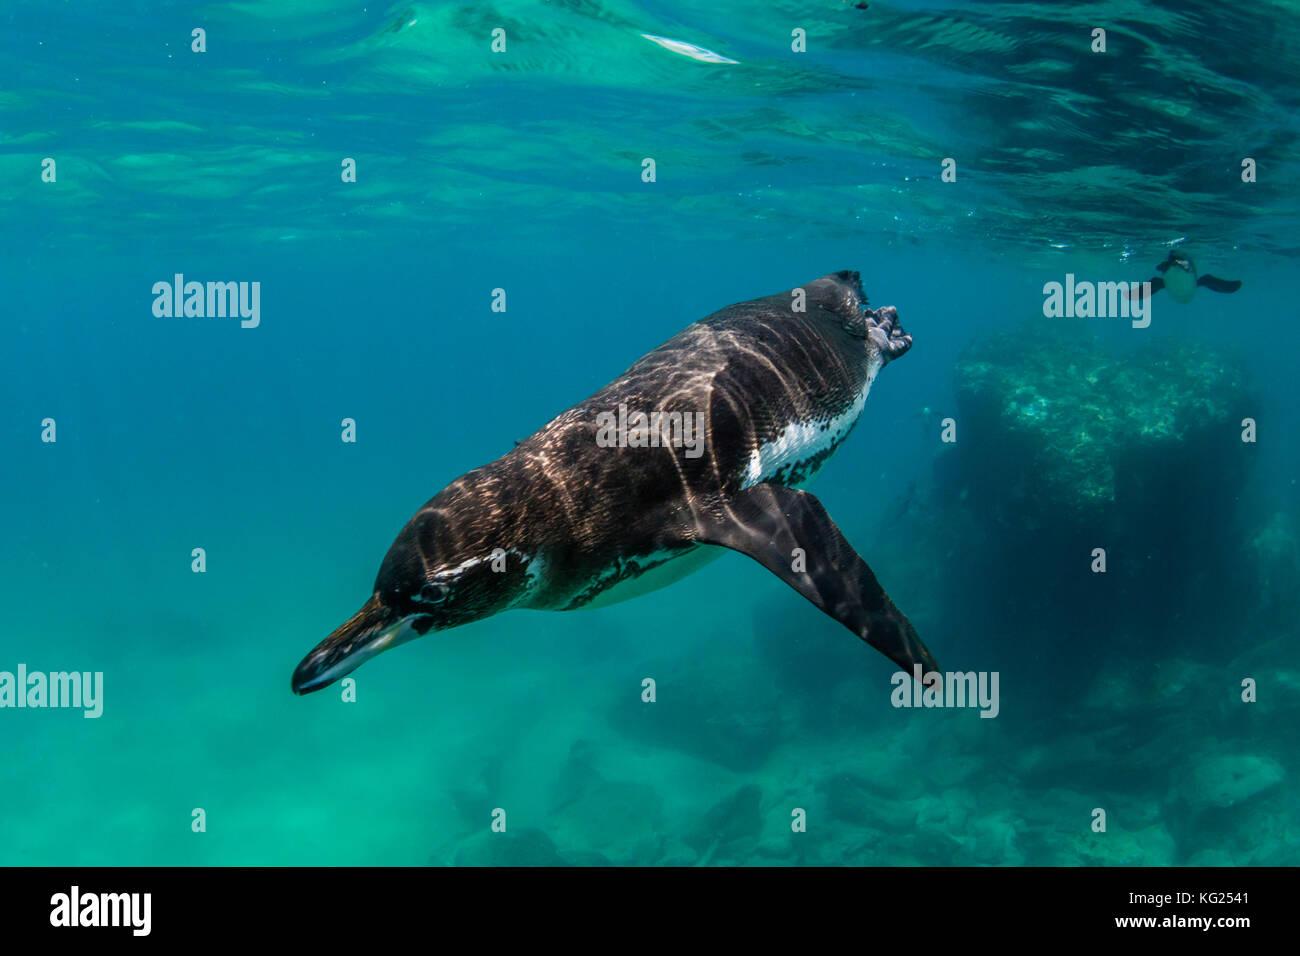 Galápagos-Pinguin (spheniscus mendiculus) Schwimmen unter Wasser bei Bartolome Insel, Galapagos, Ecuador, Südamerika Stockbild